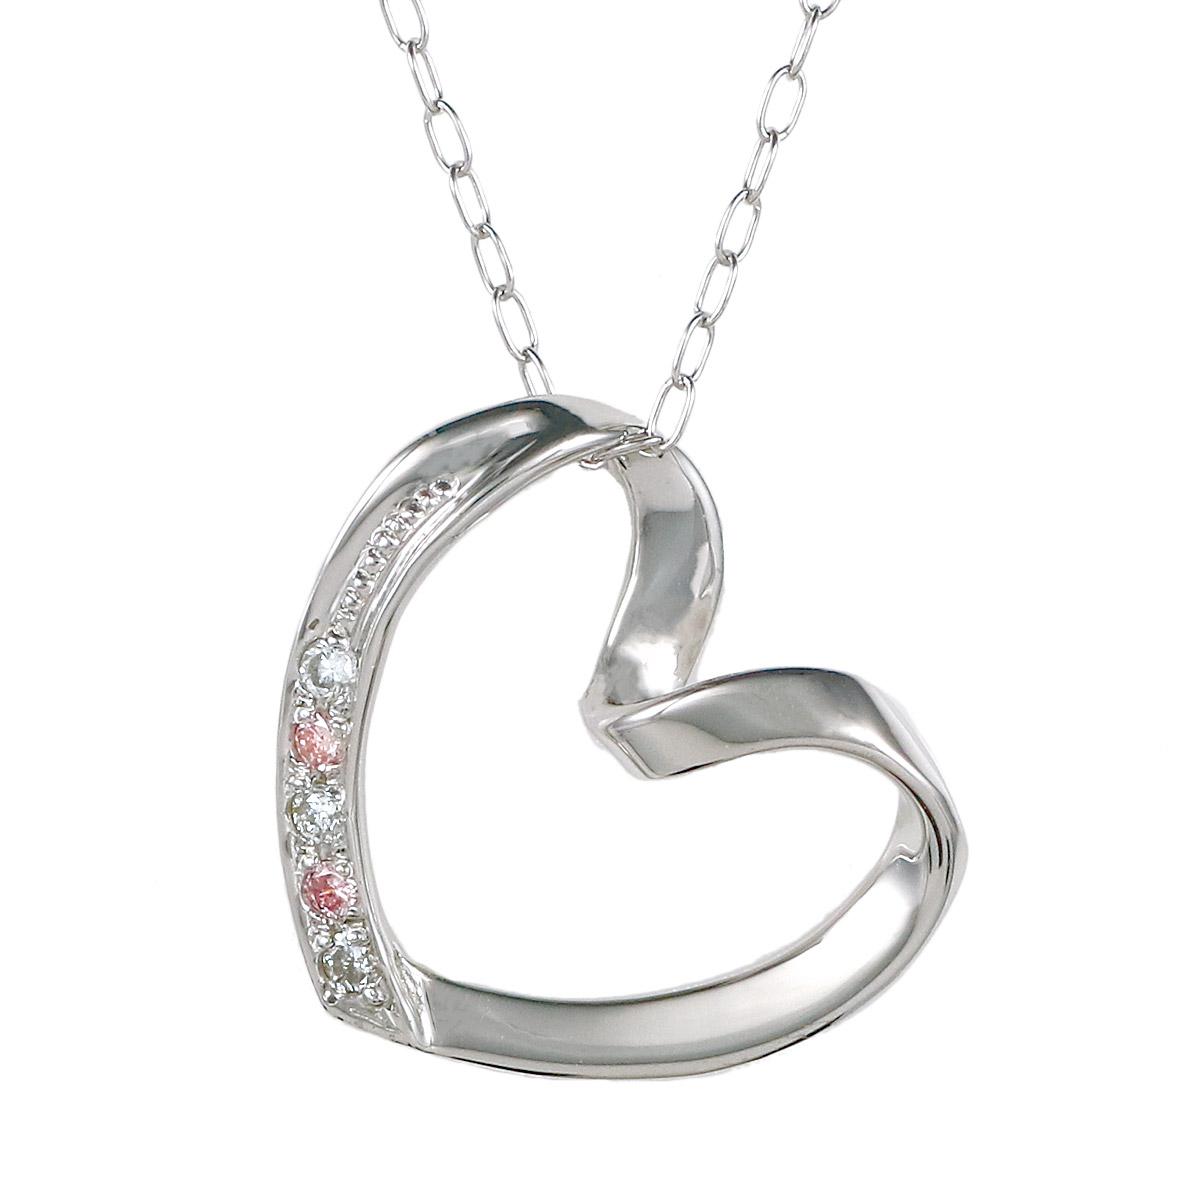 Jewelry SUEHIRO  Pink diamonds Diamond White Gold Diamond diamond necklace  necklaces to her present gift wrapping free-QP  b90f94f02901